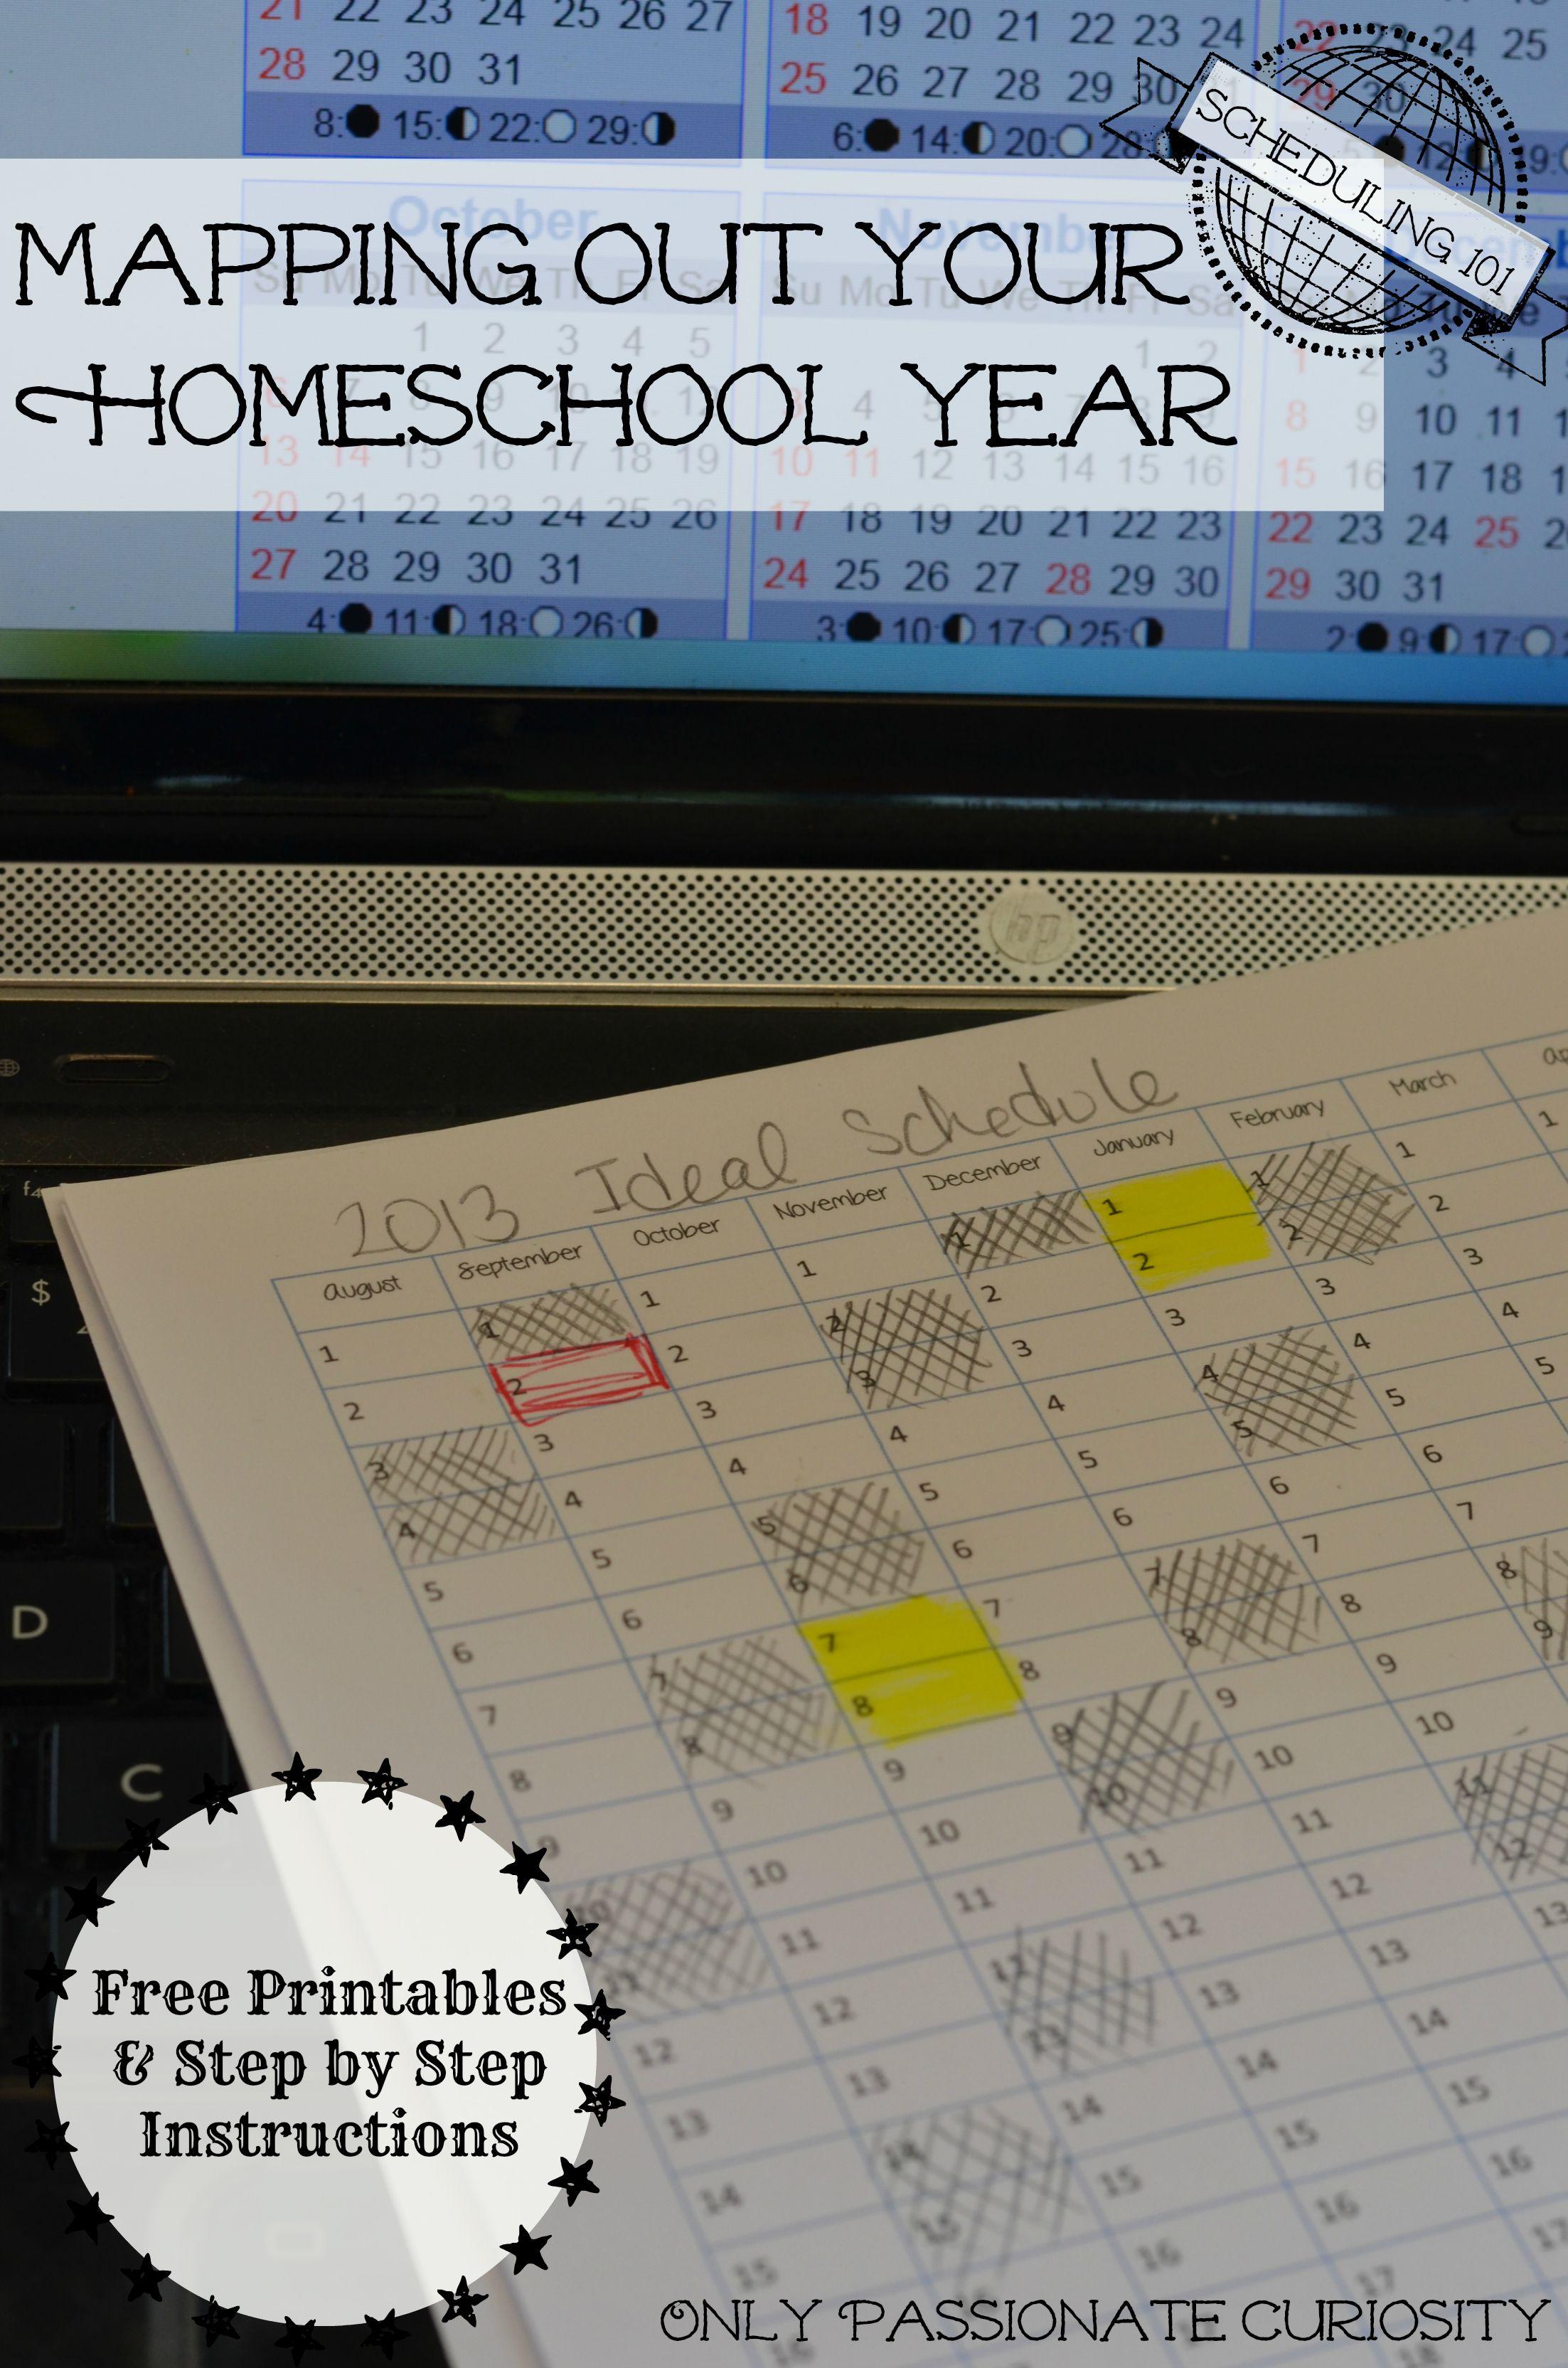 Homeschool Scheduling 101 Planning Your Year